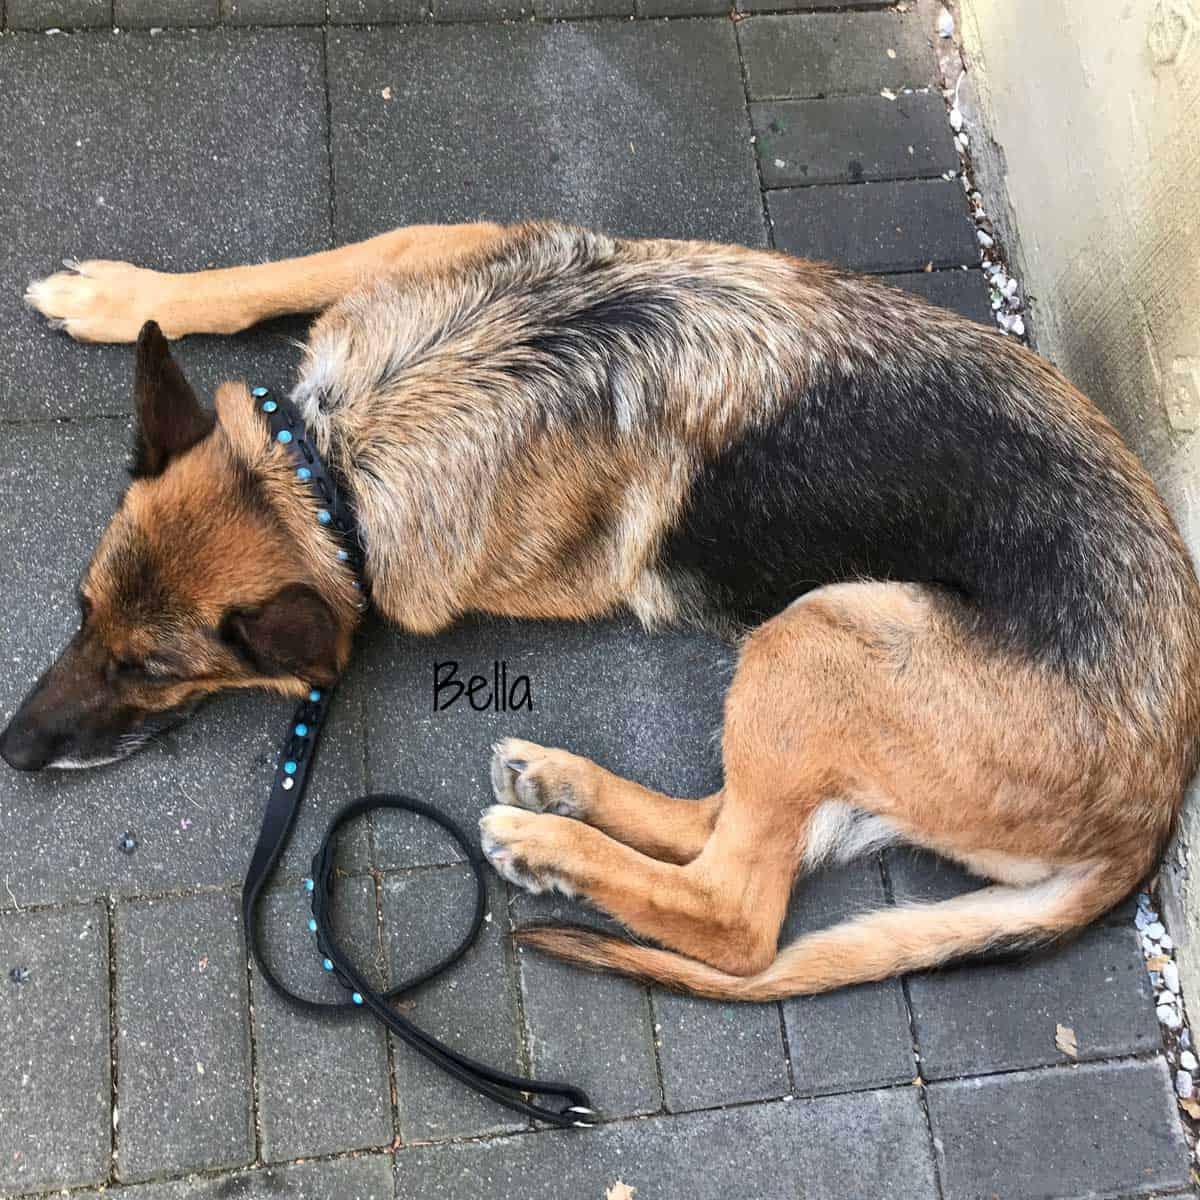 Hundehalsband Zugstopp Fettleder in 3 Farben dekoriert mit Türkisen